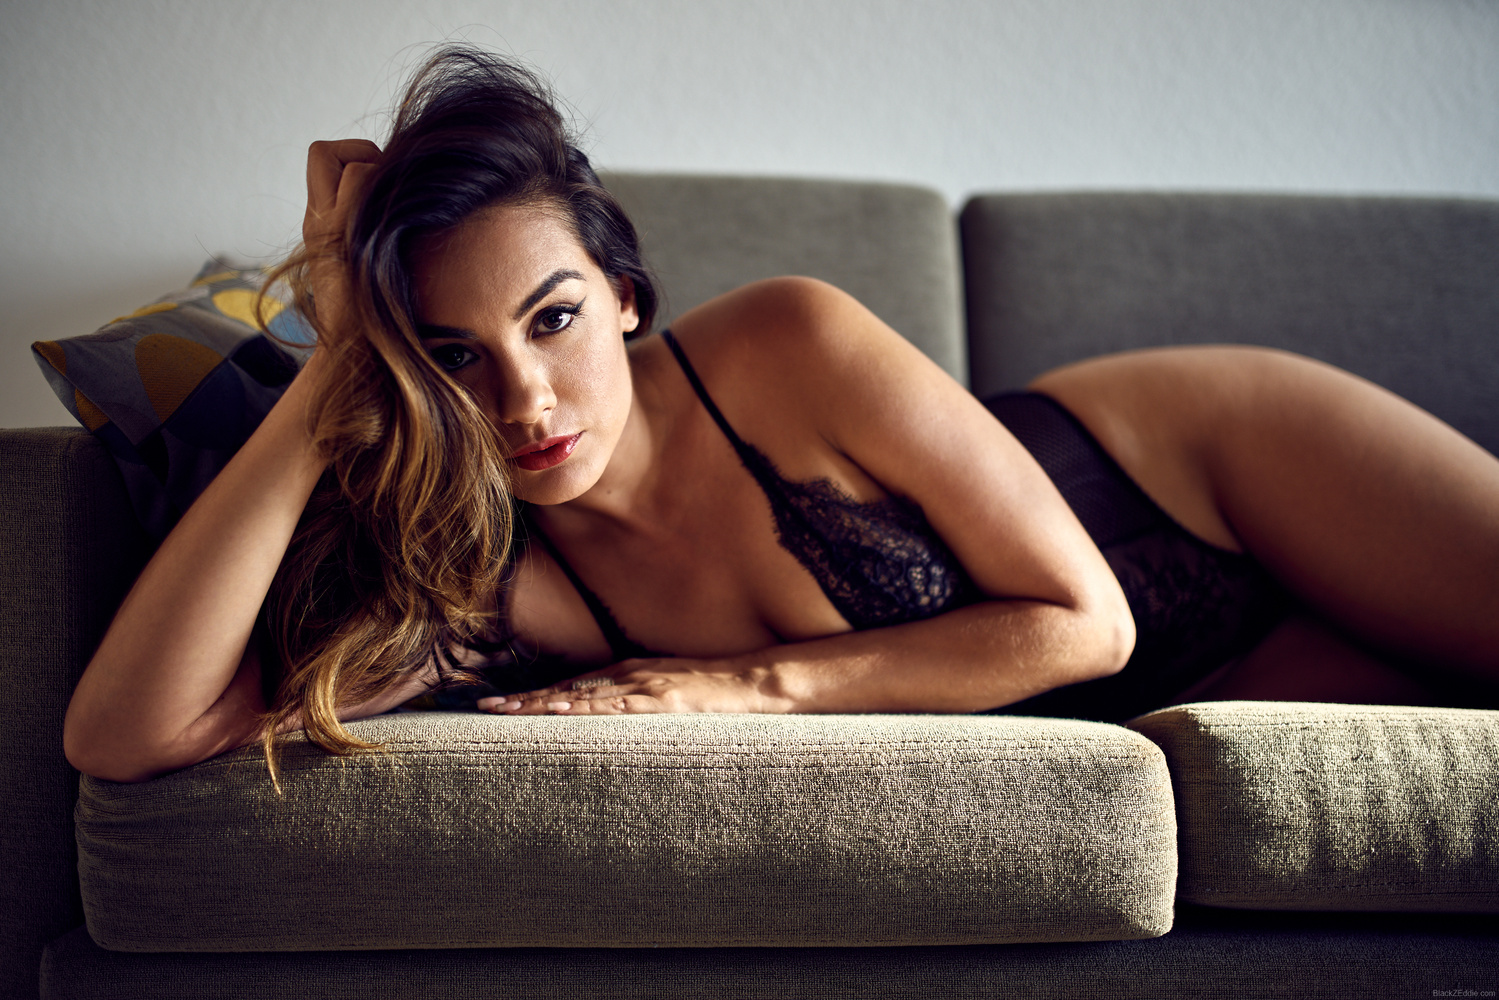 Leticia Estrada @ San Diego by Black Z Eddie .